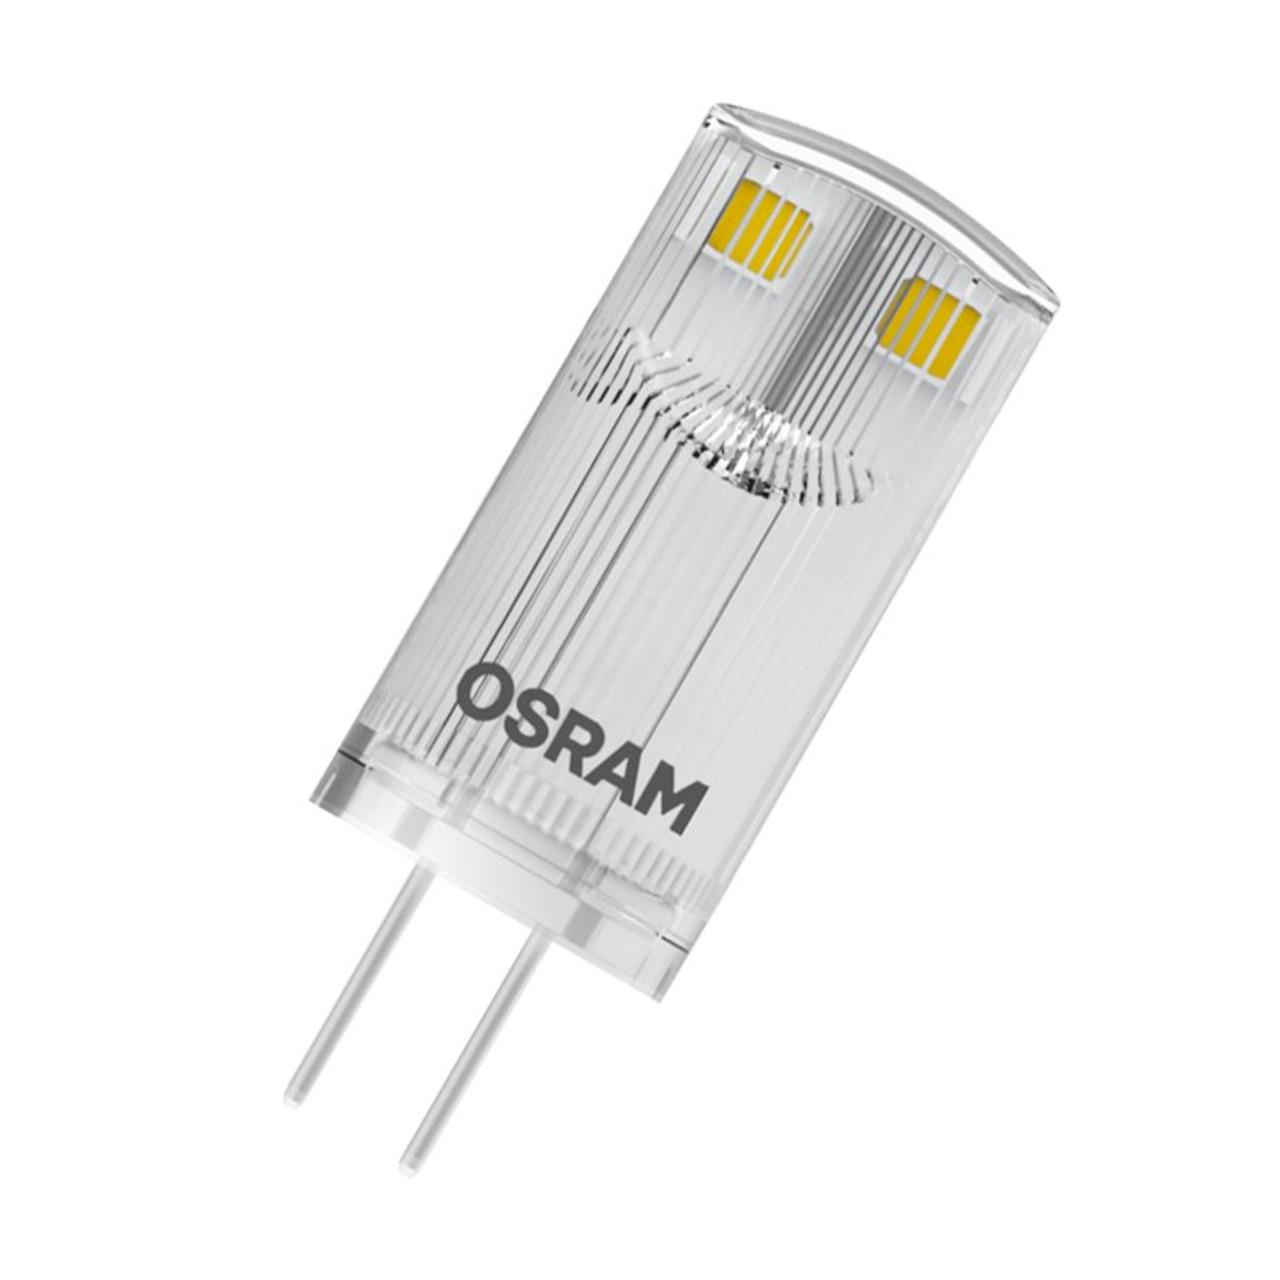 OSRAM 3er Set 1-8-W-LED-Lampe T13- G4- 200 lm- warmweiss- 12 V